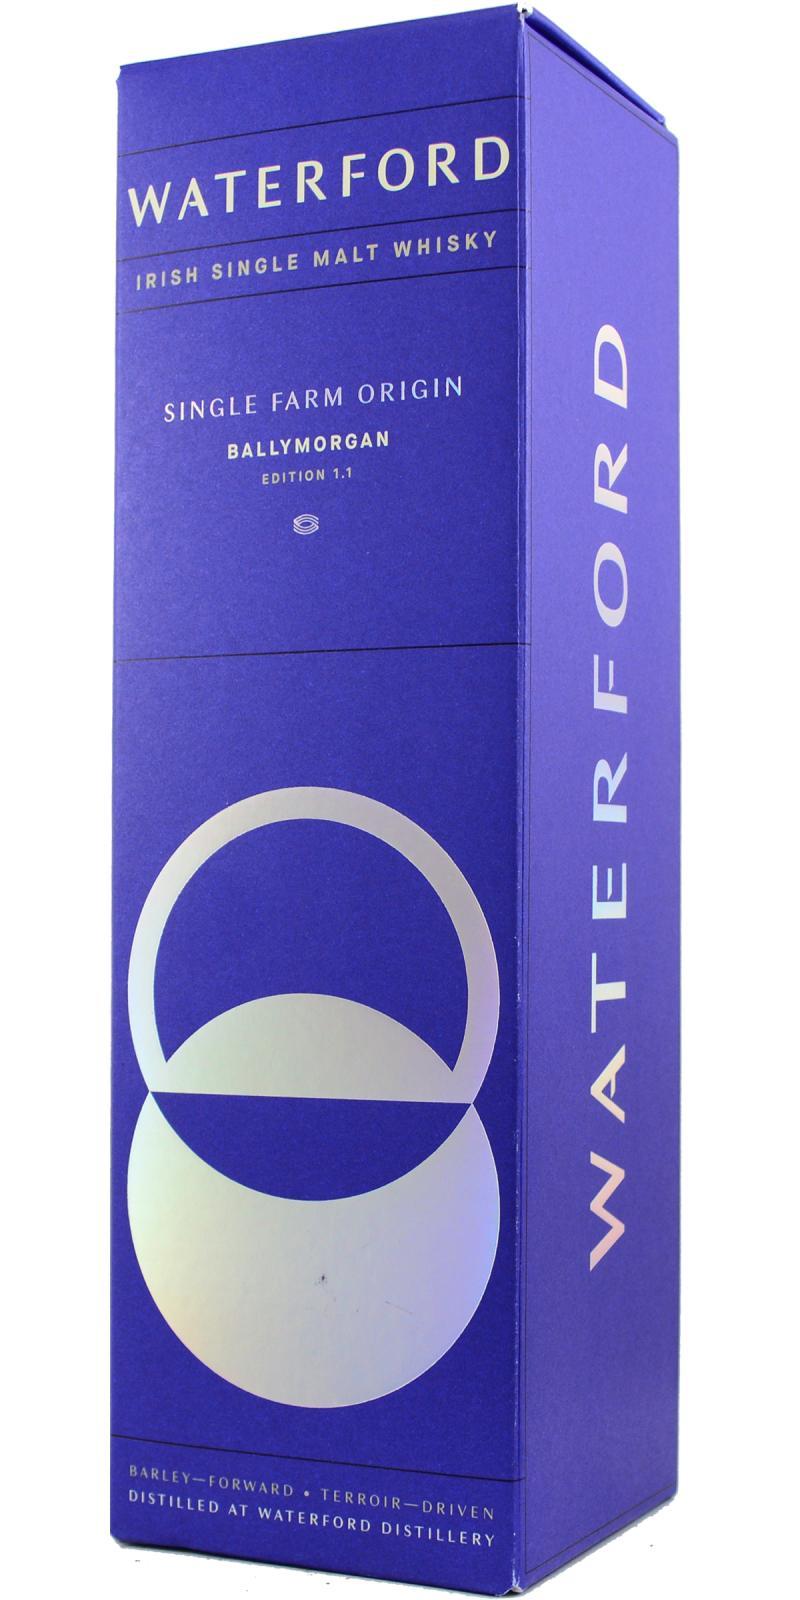 Waterford Ballymorgan: Edition 1.1